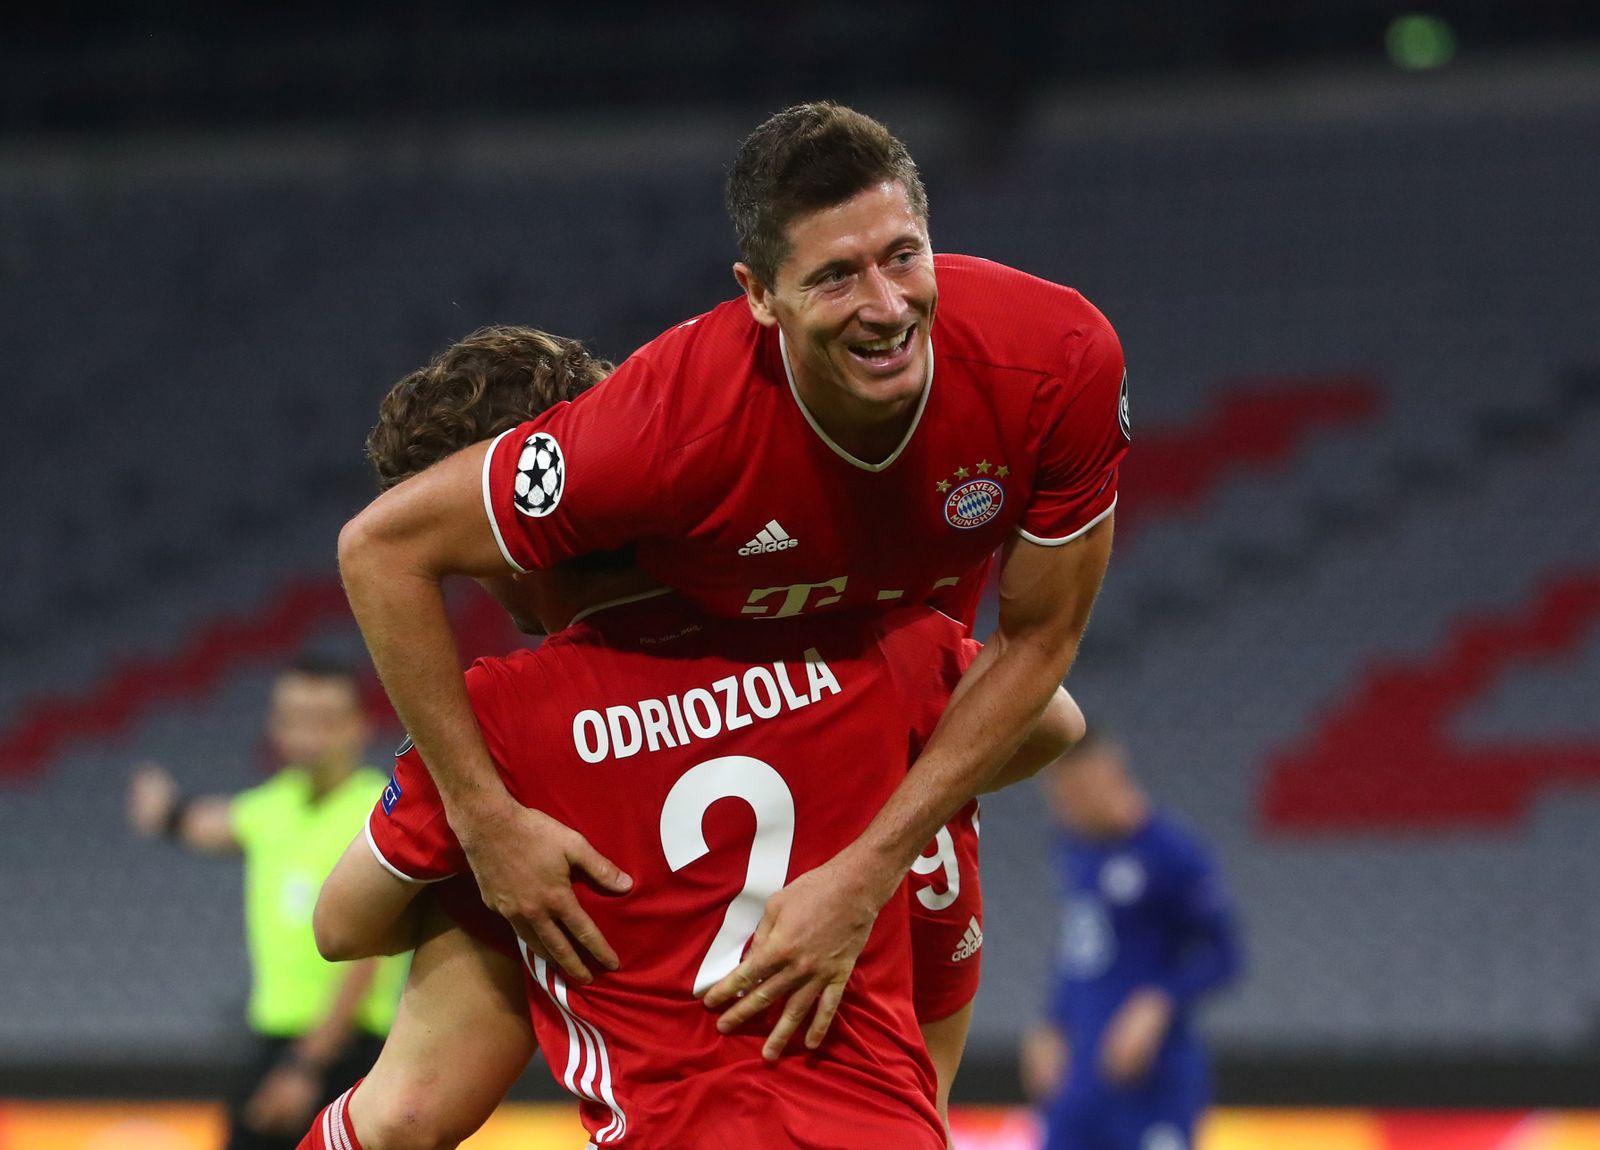 Champions League - Round of 16 Second Leg - Bayern Munich v Chelsea